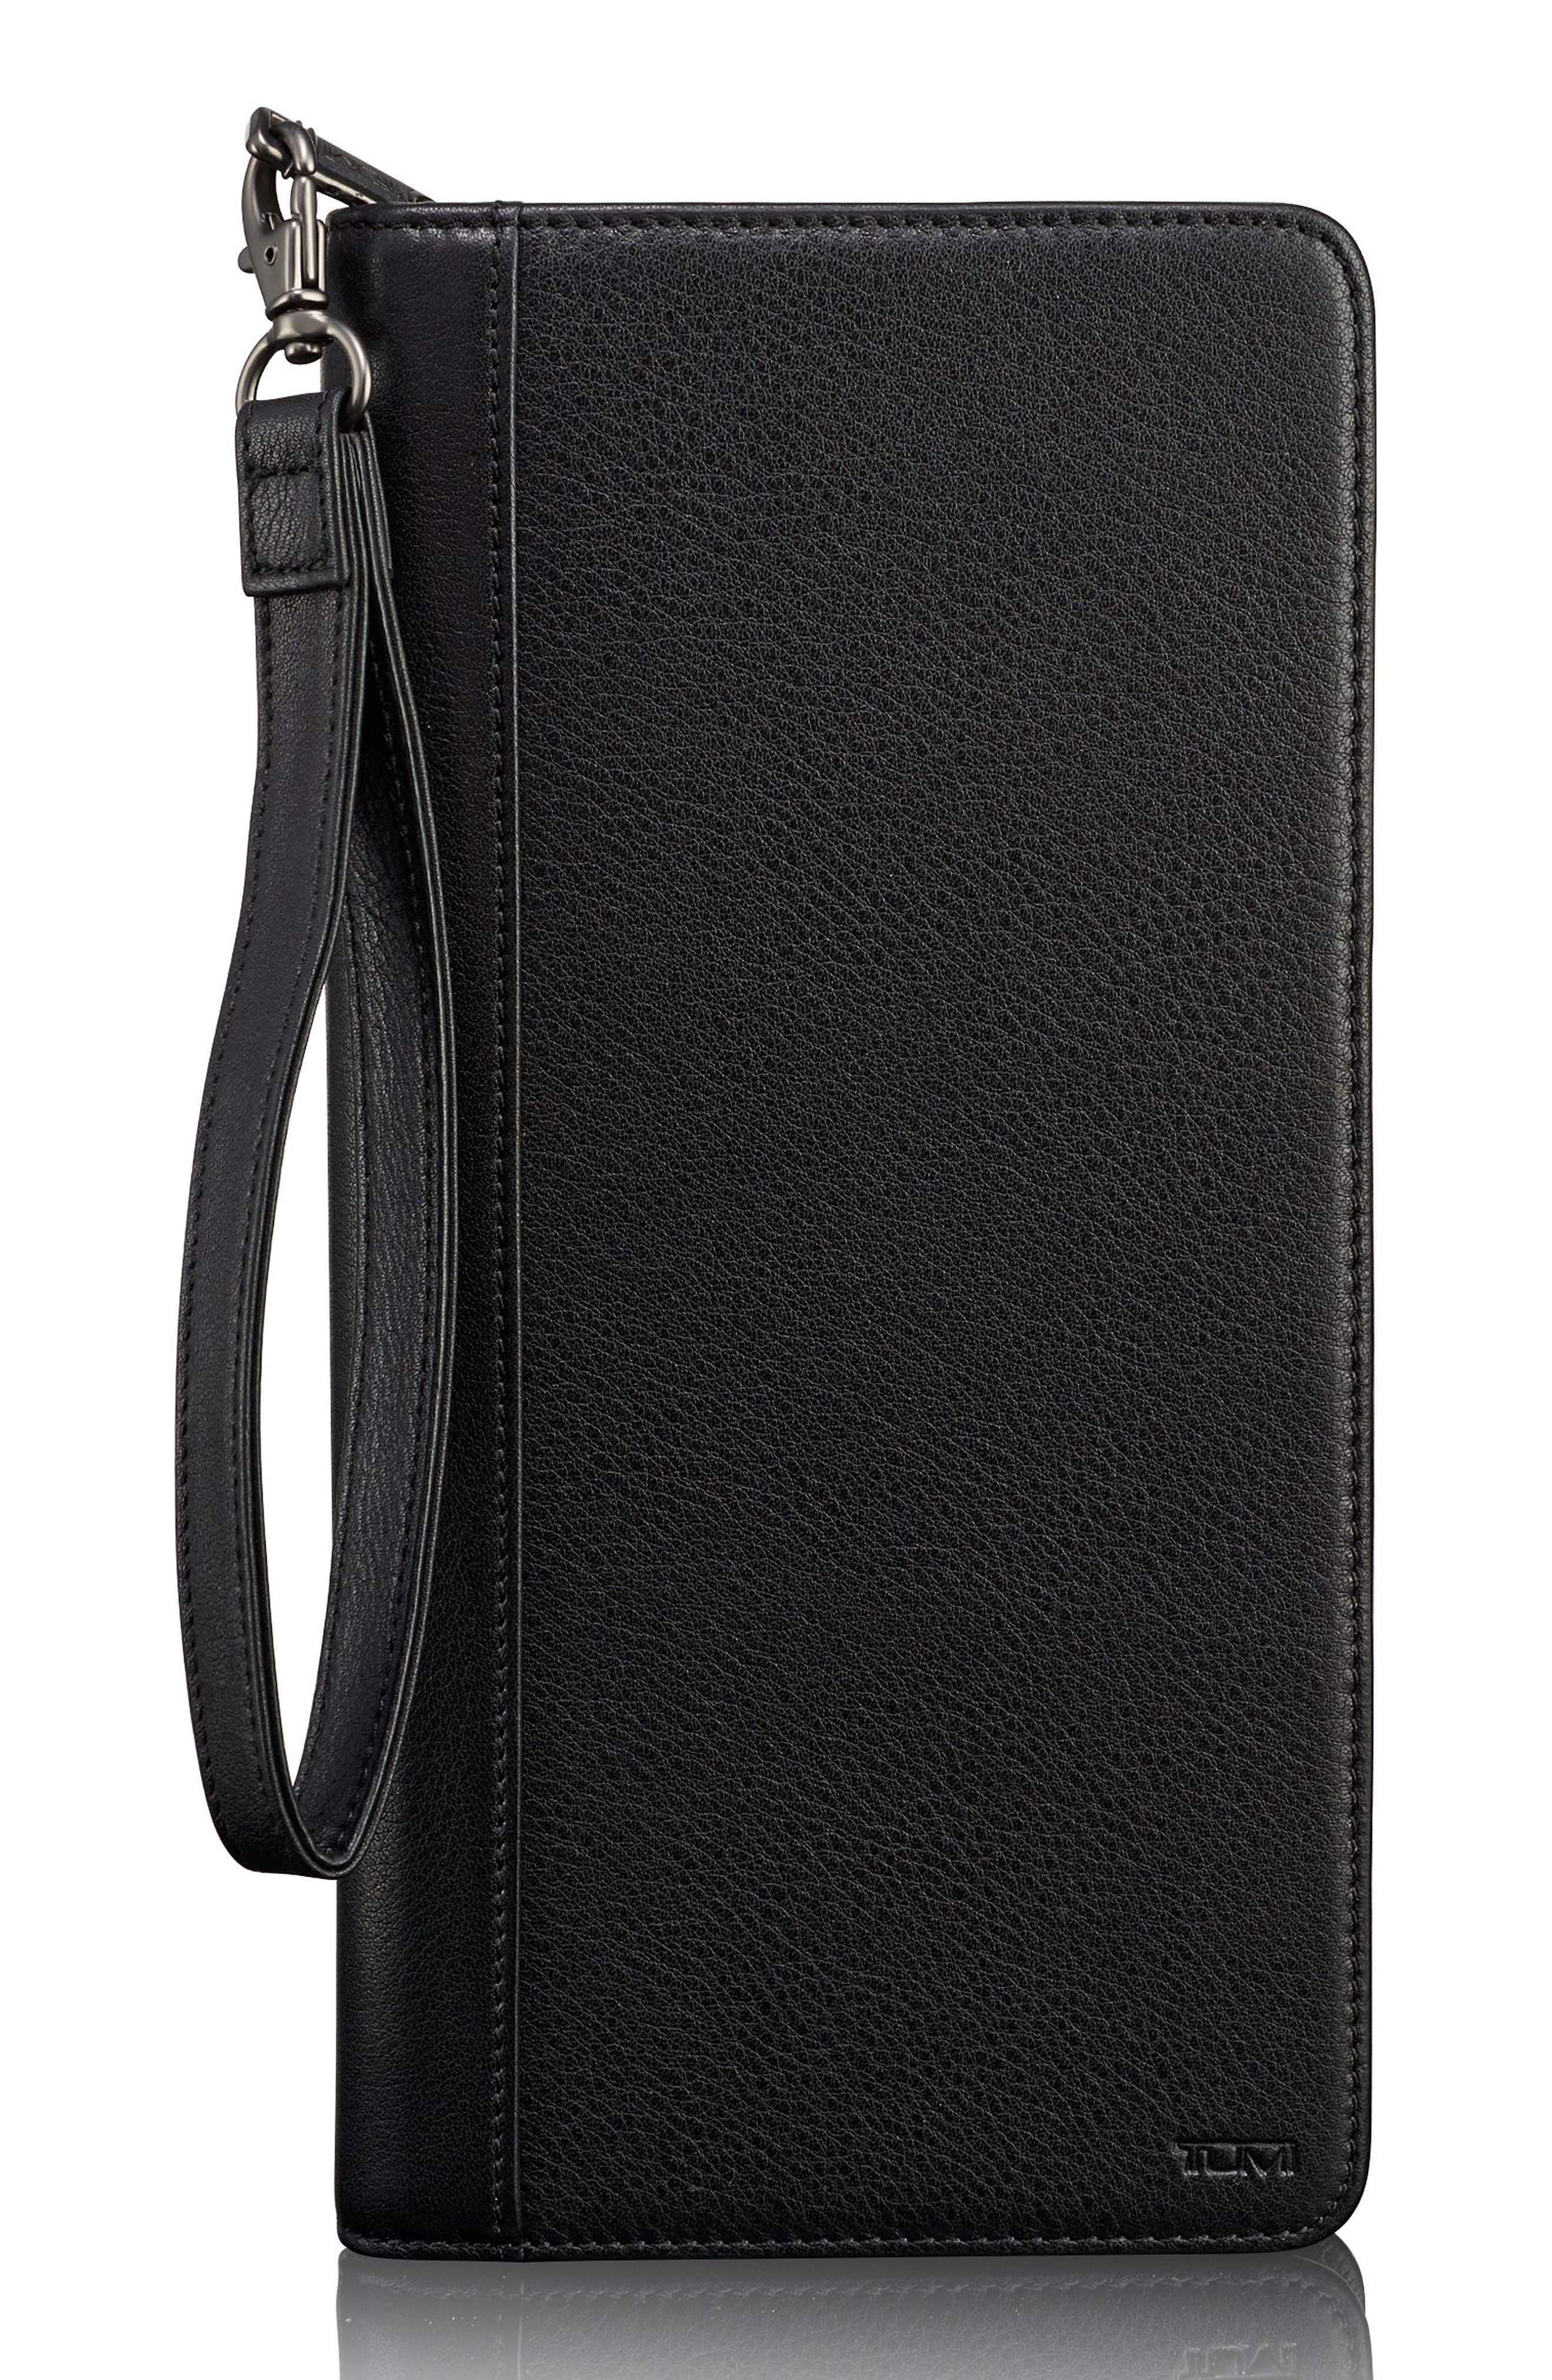 Leather Zip Wallet,                         Main,                         color, Black Textured